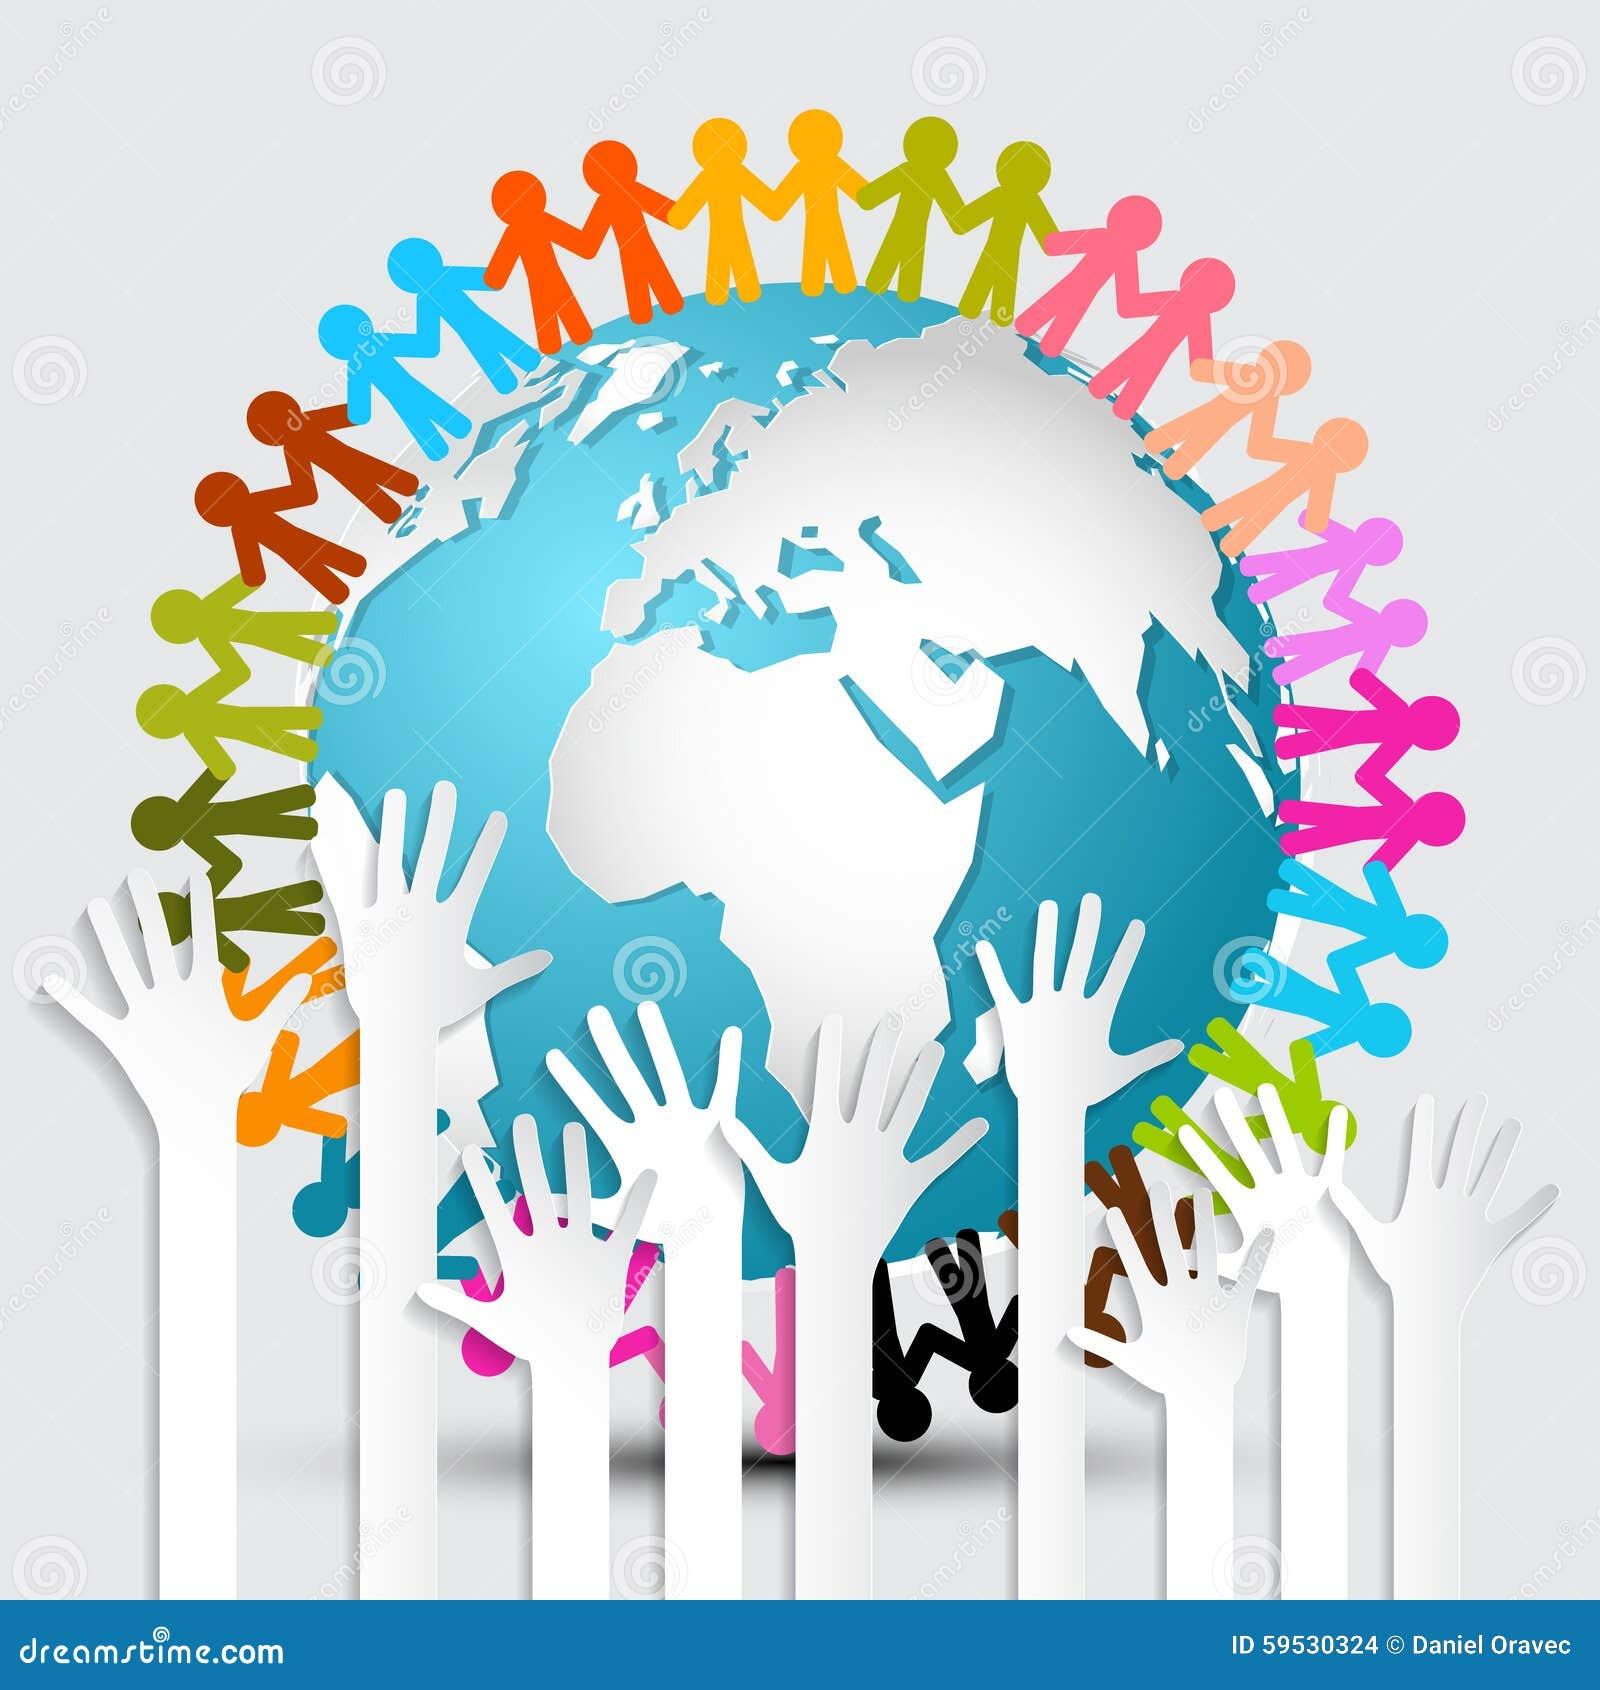 volunteers around the world medication fundraiser custom ink fundraising